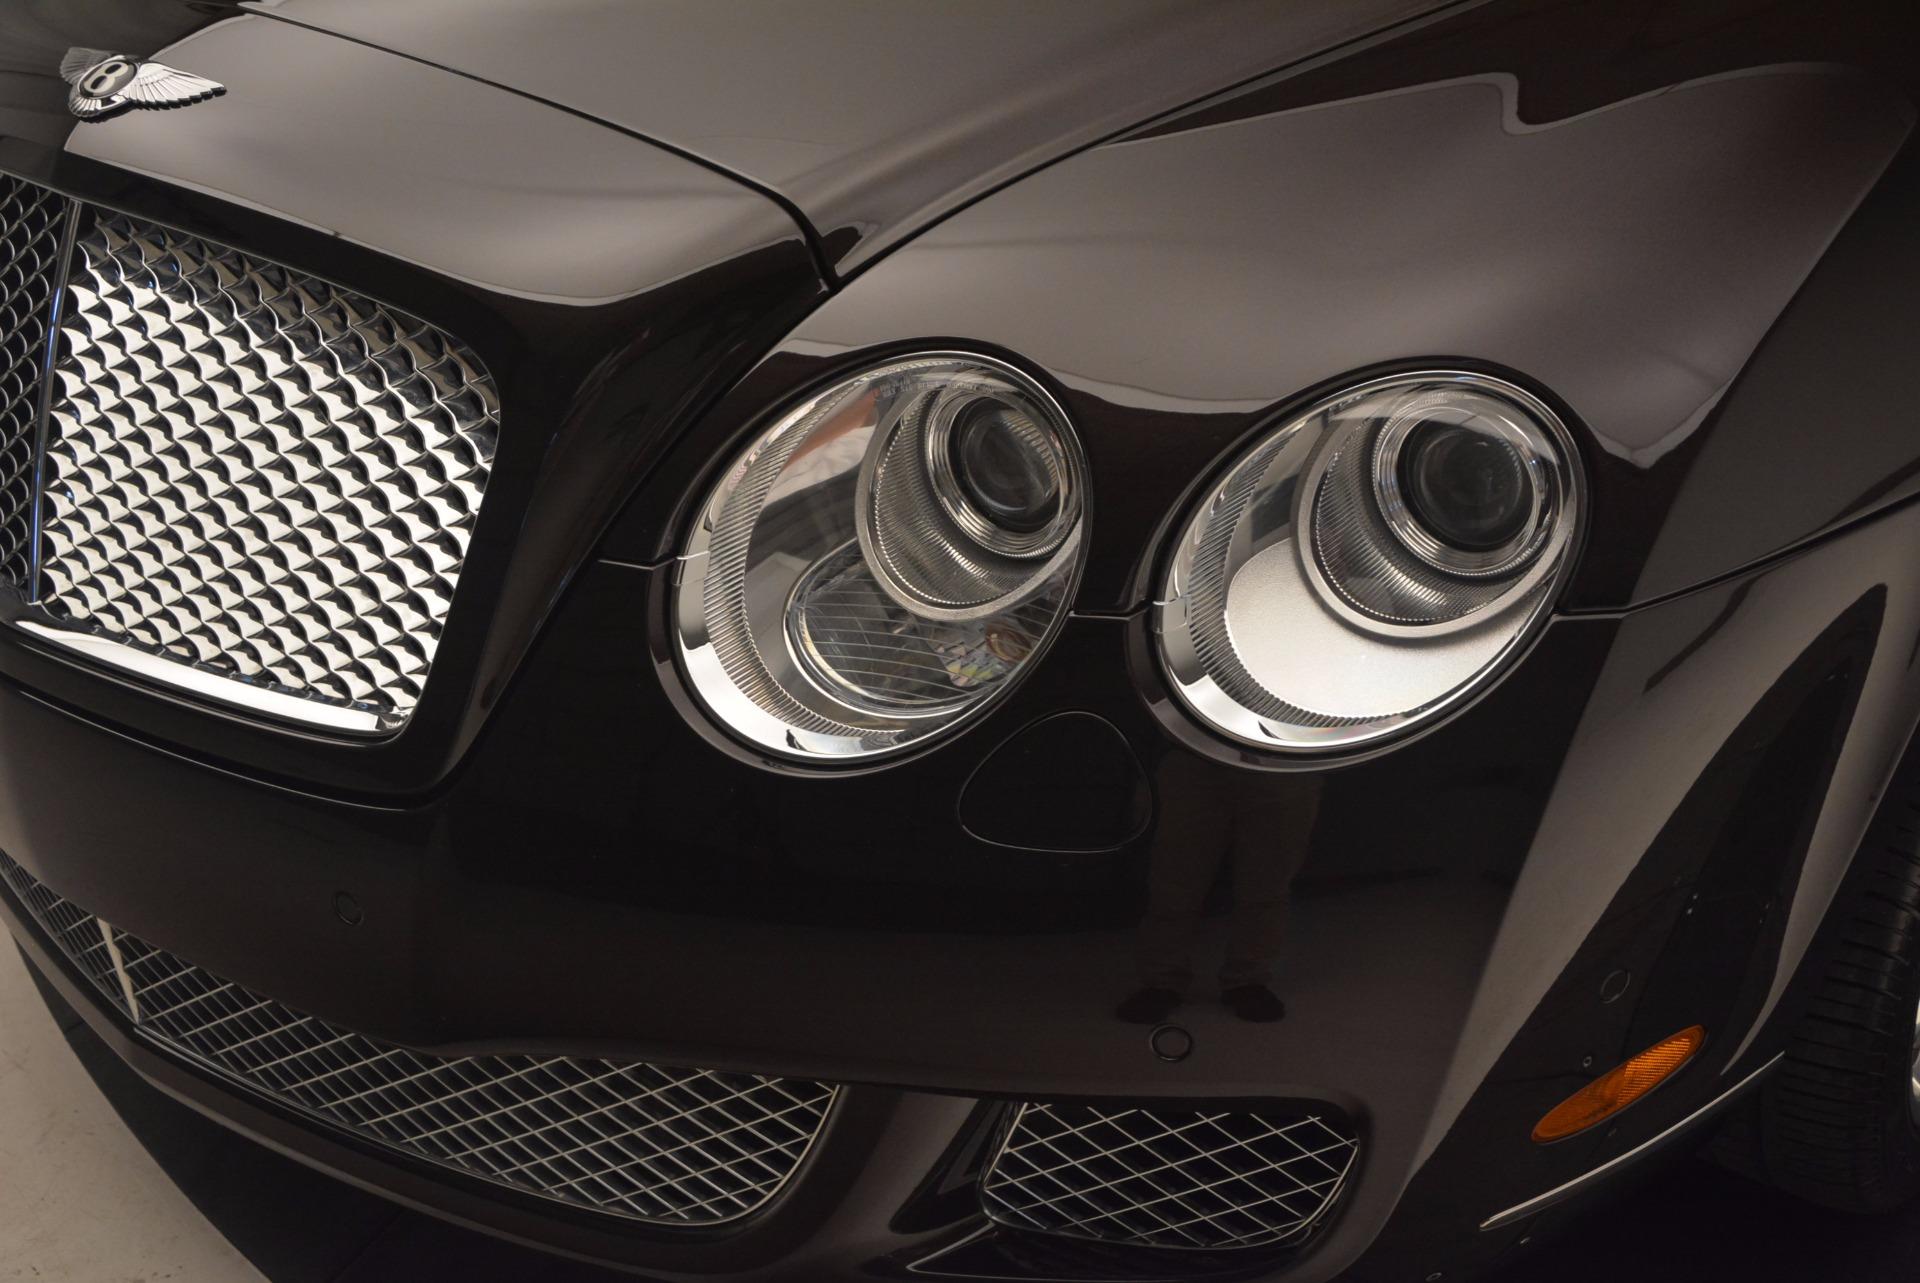 Used 2010 Bentley Continental GT Series 51 For Sale In Westport, CT 1222_p27